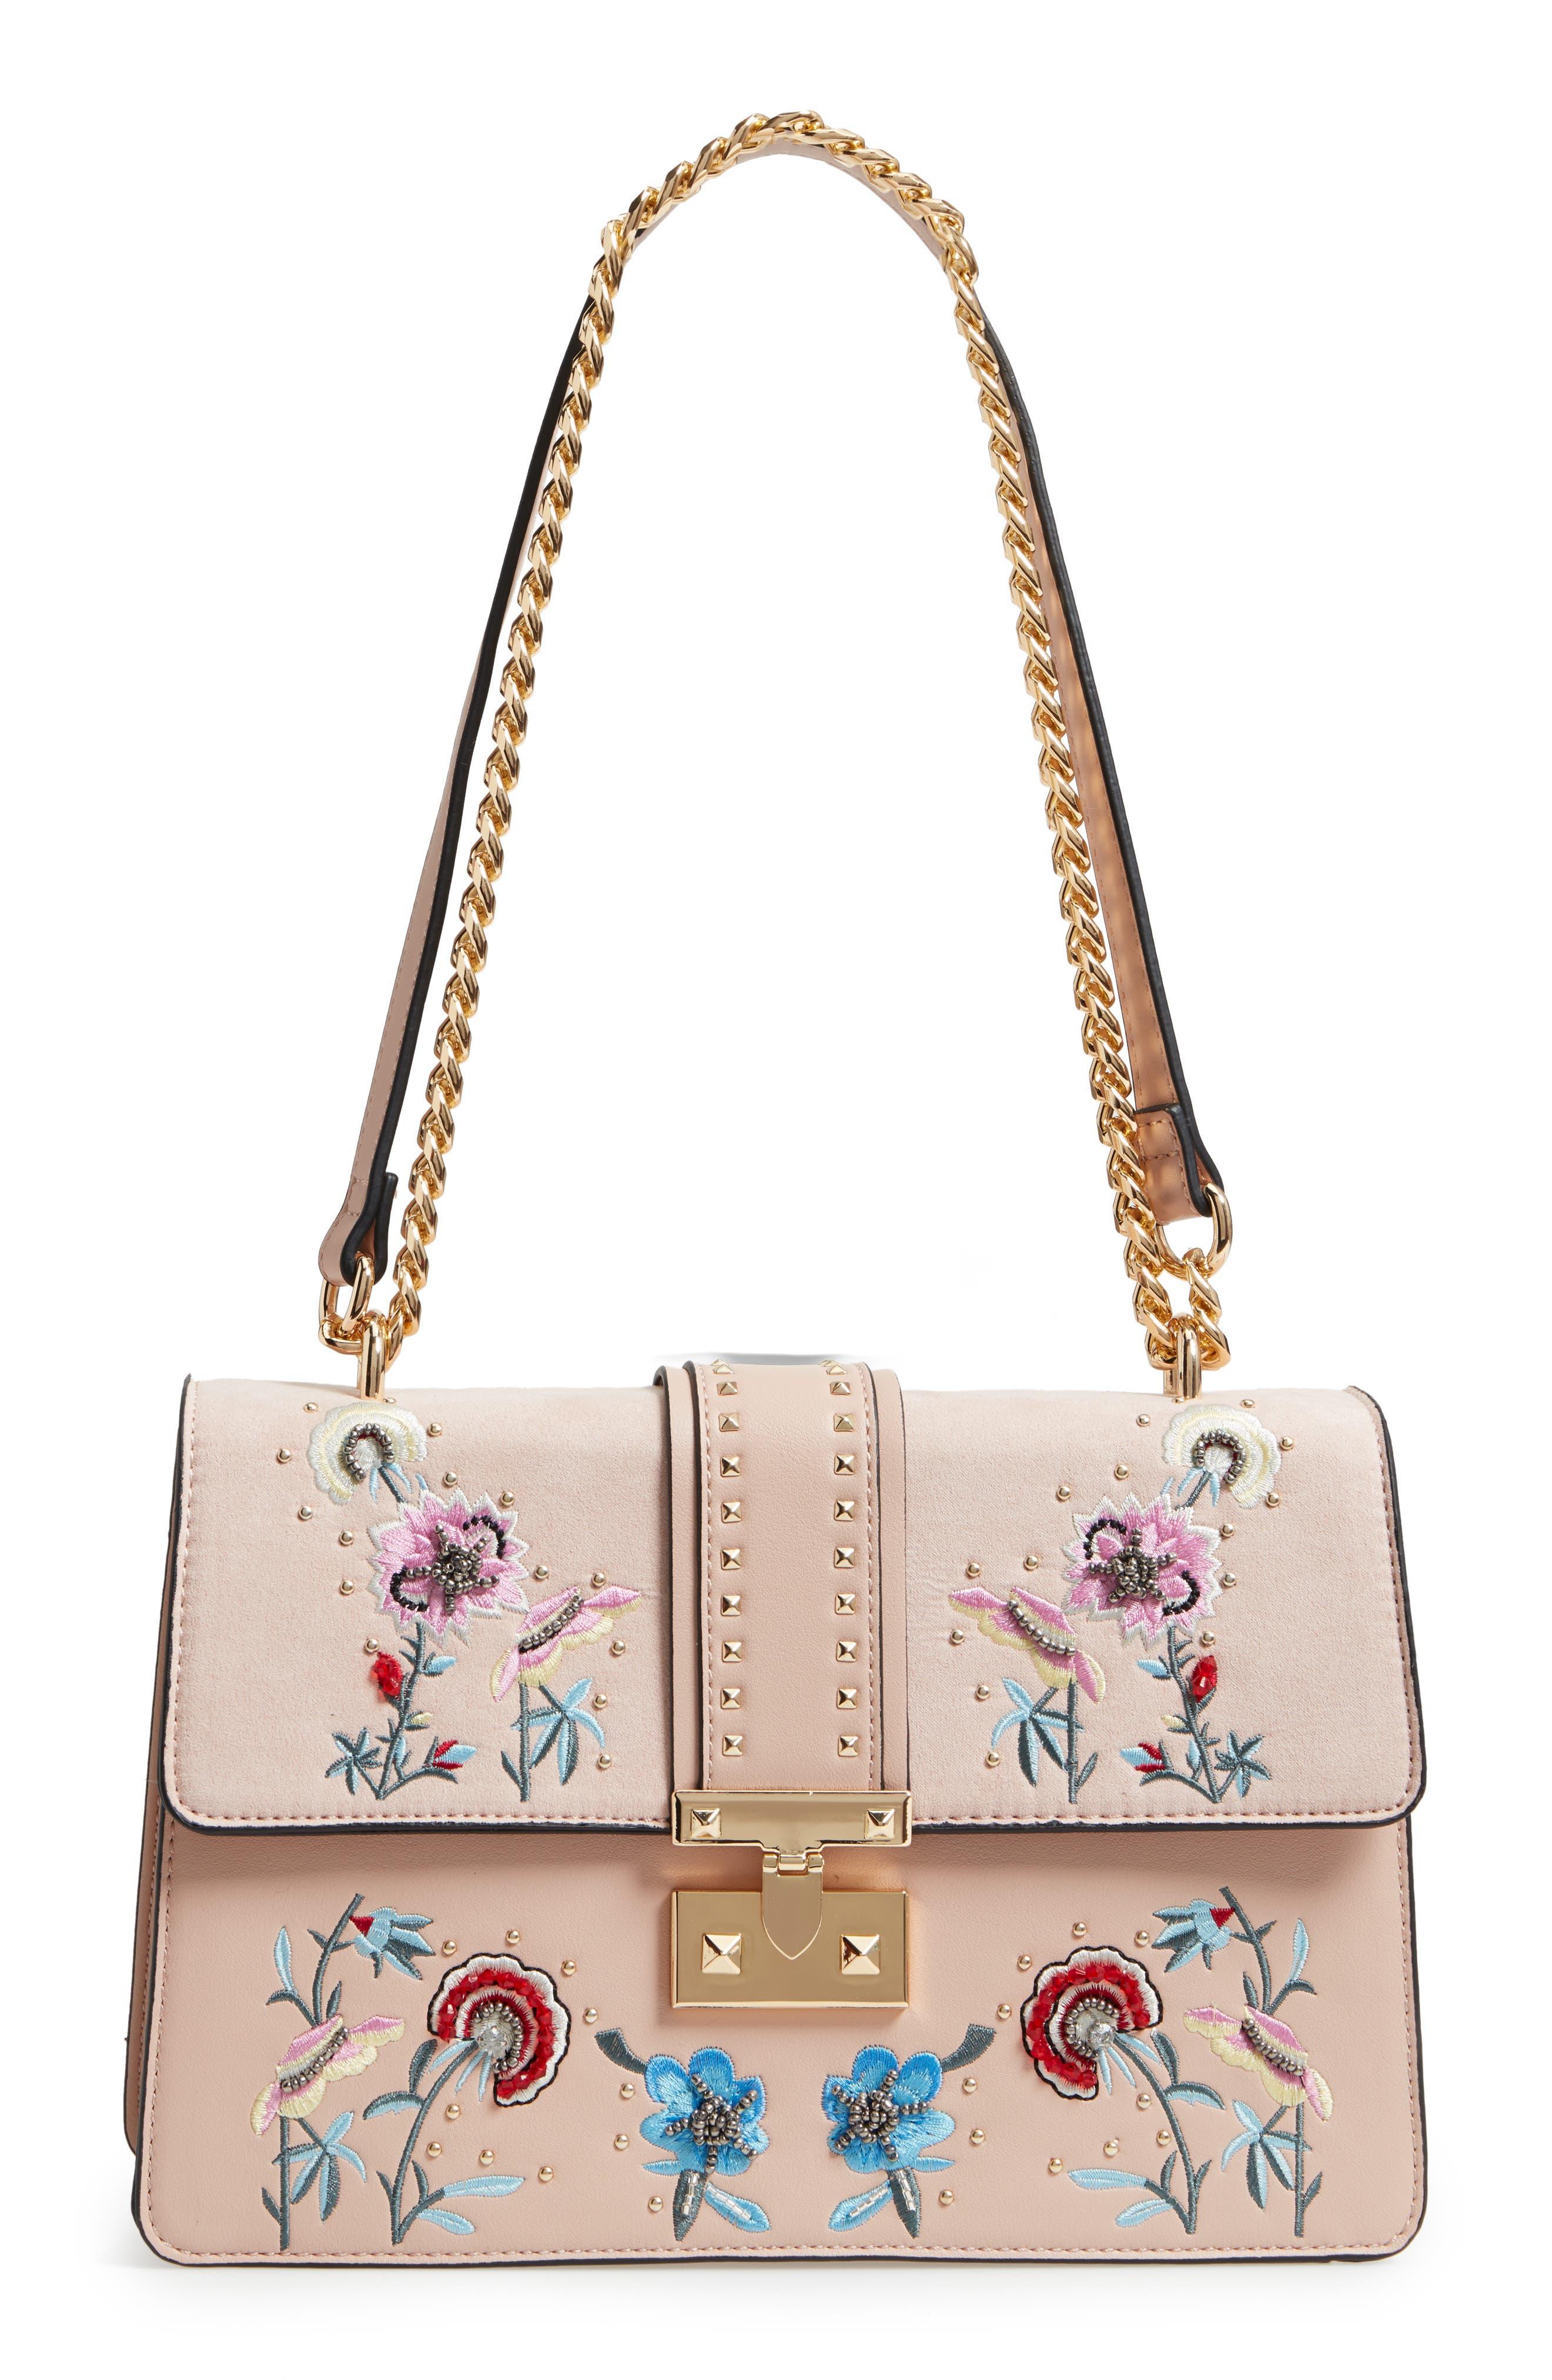 Darcy Floral Shoulder Bag,                             Main thumbnail 1, color,                             PINK MULTI